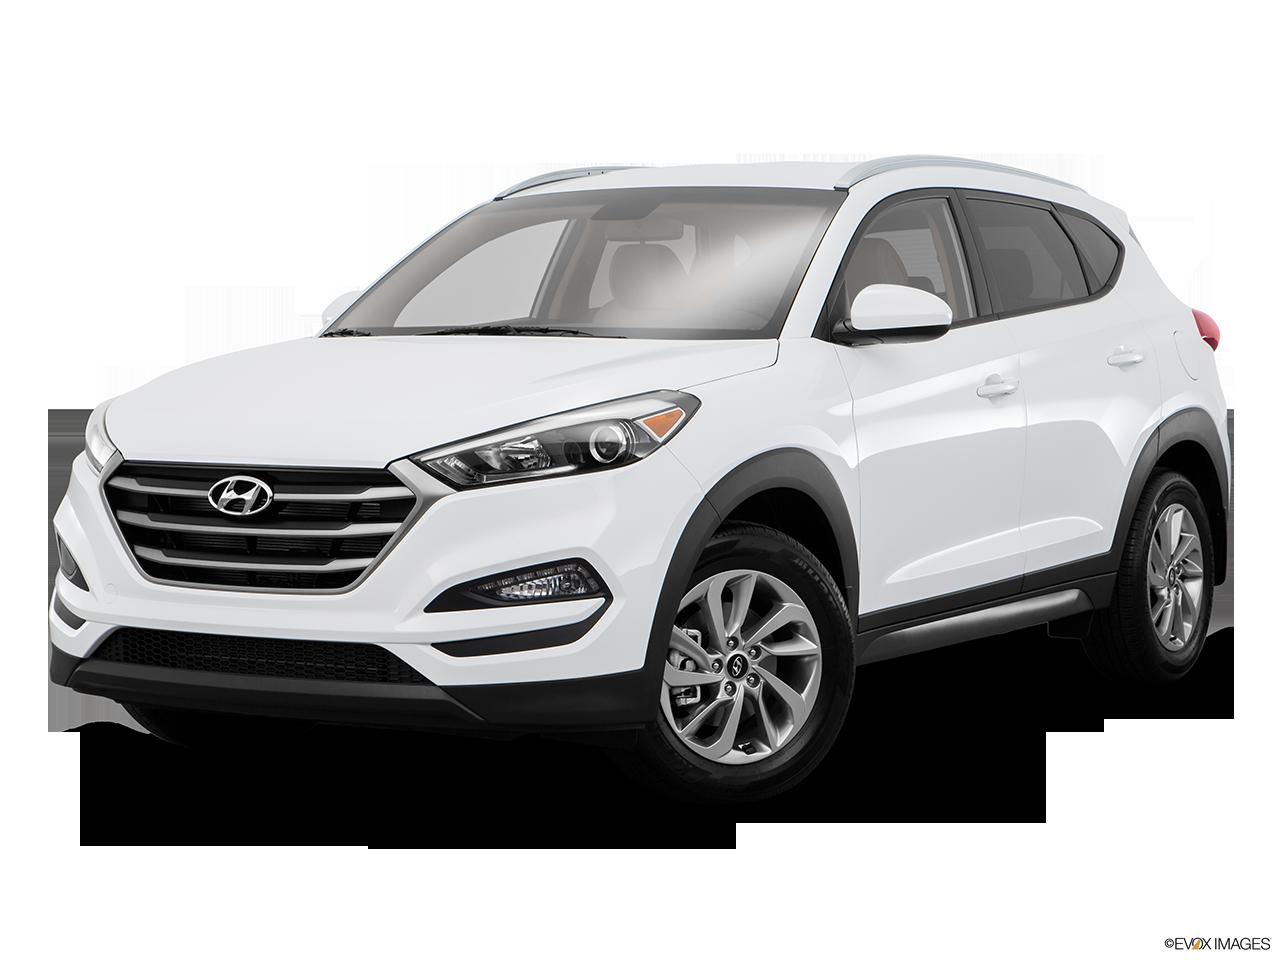 New 2017 Hyundai Tucson NH | Concord | Manchester | Deals